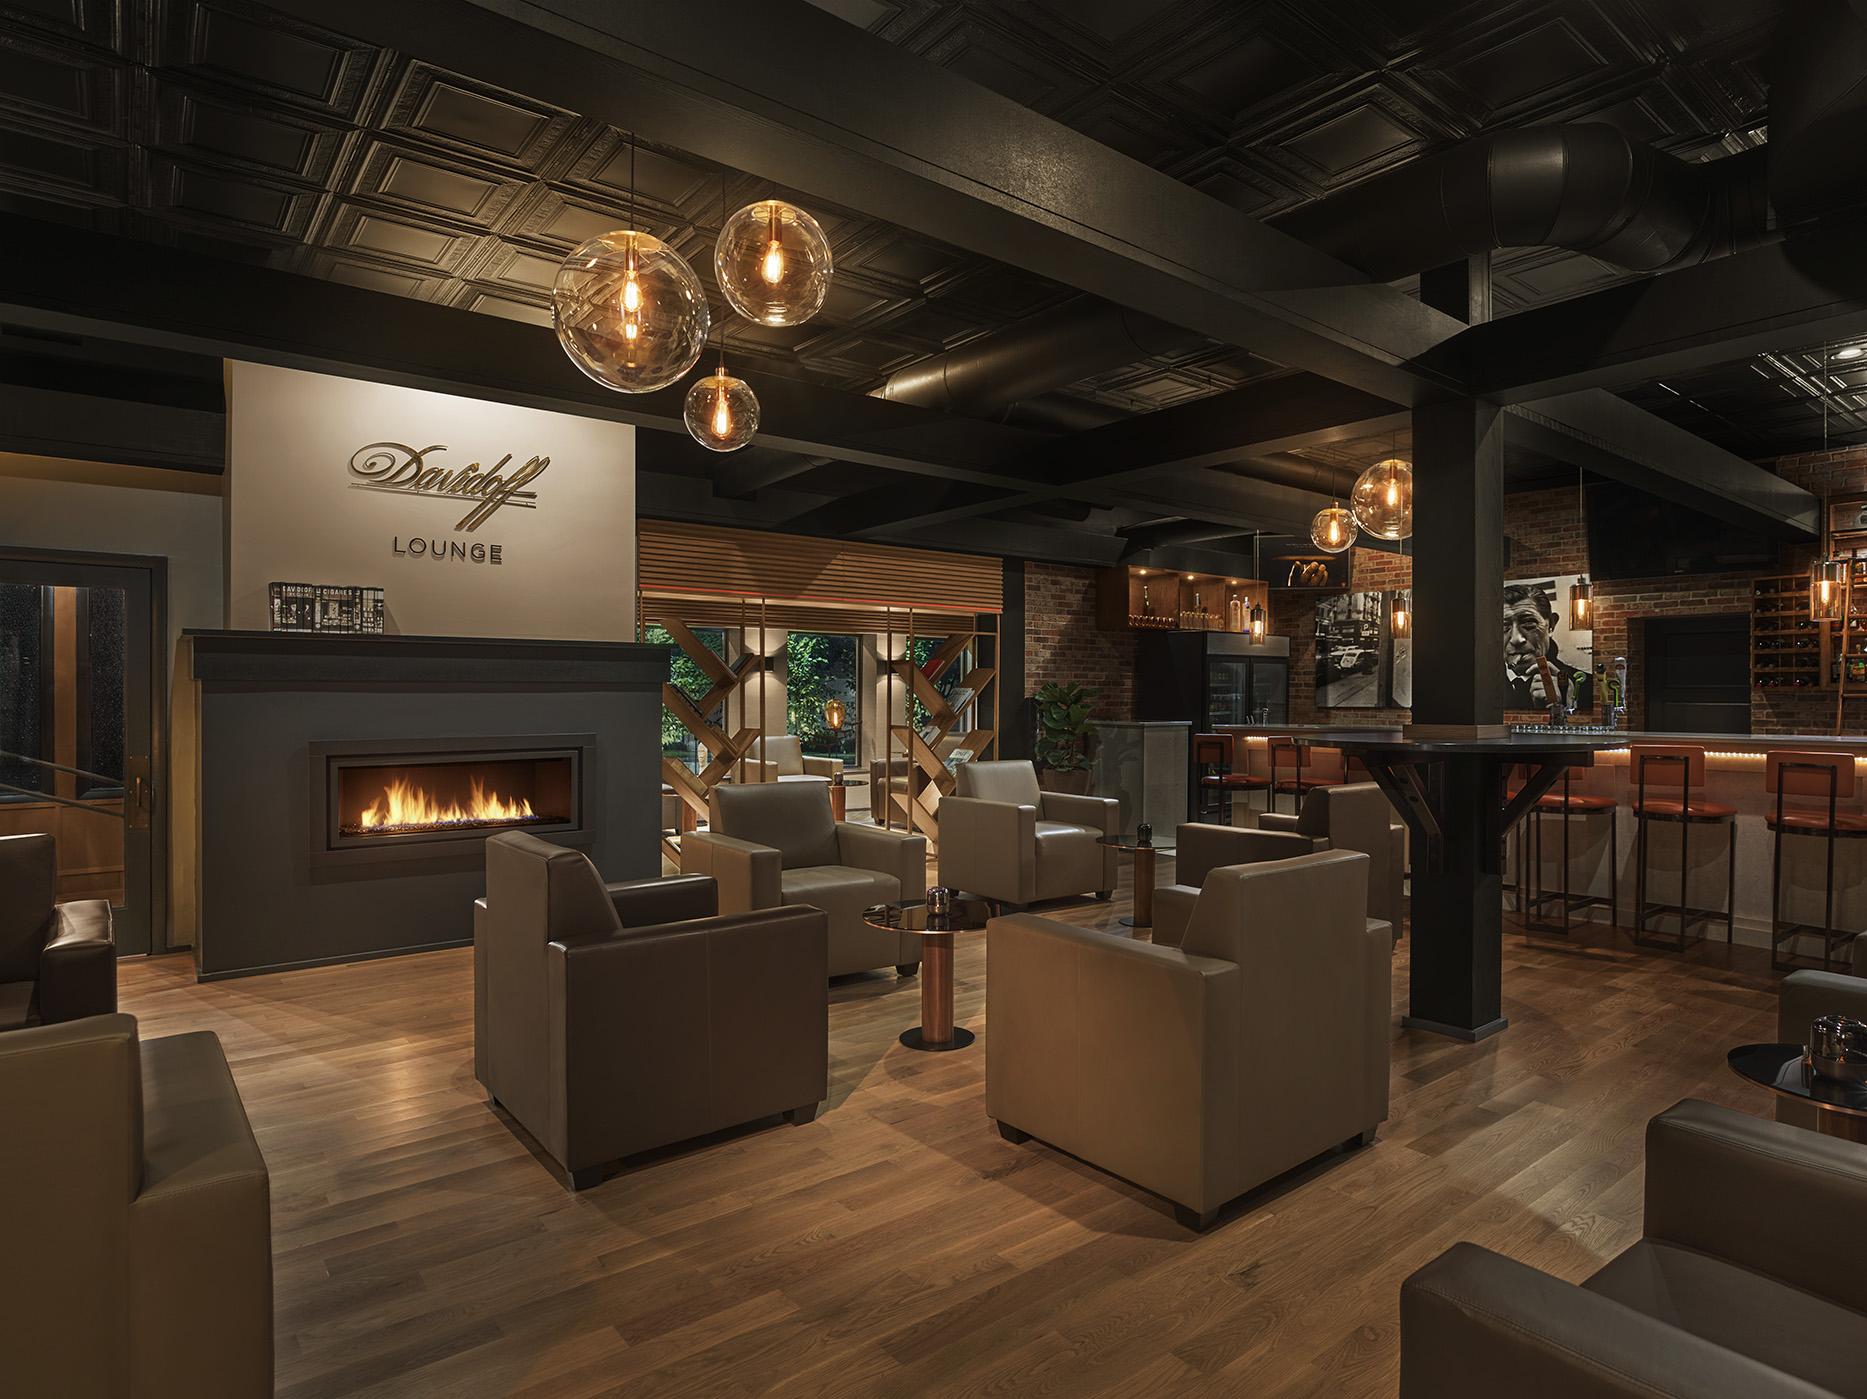 Cigar News: Davidoff Lounge Comes to Greensboro, North Carolina